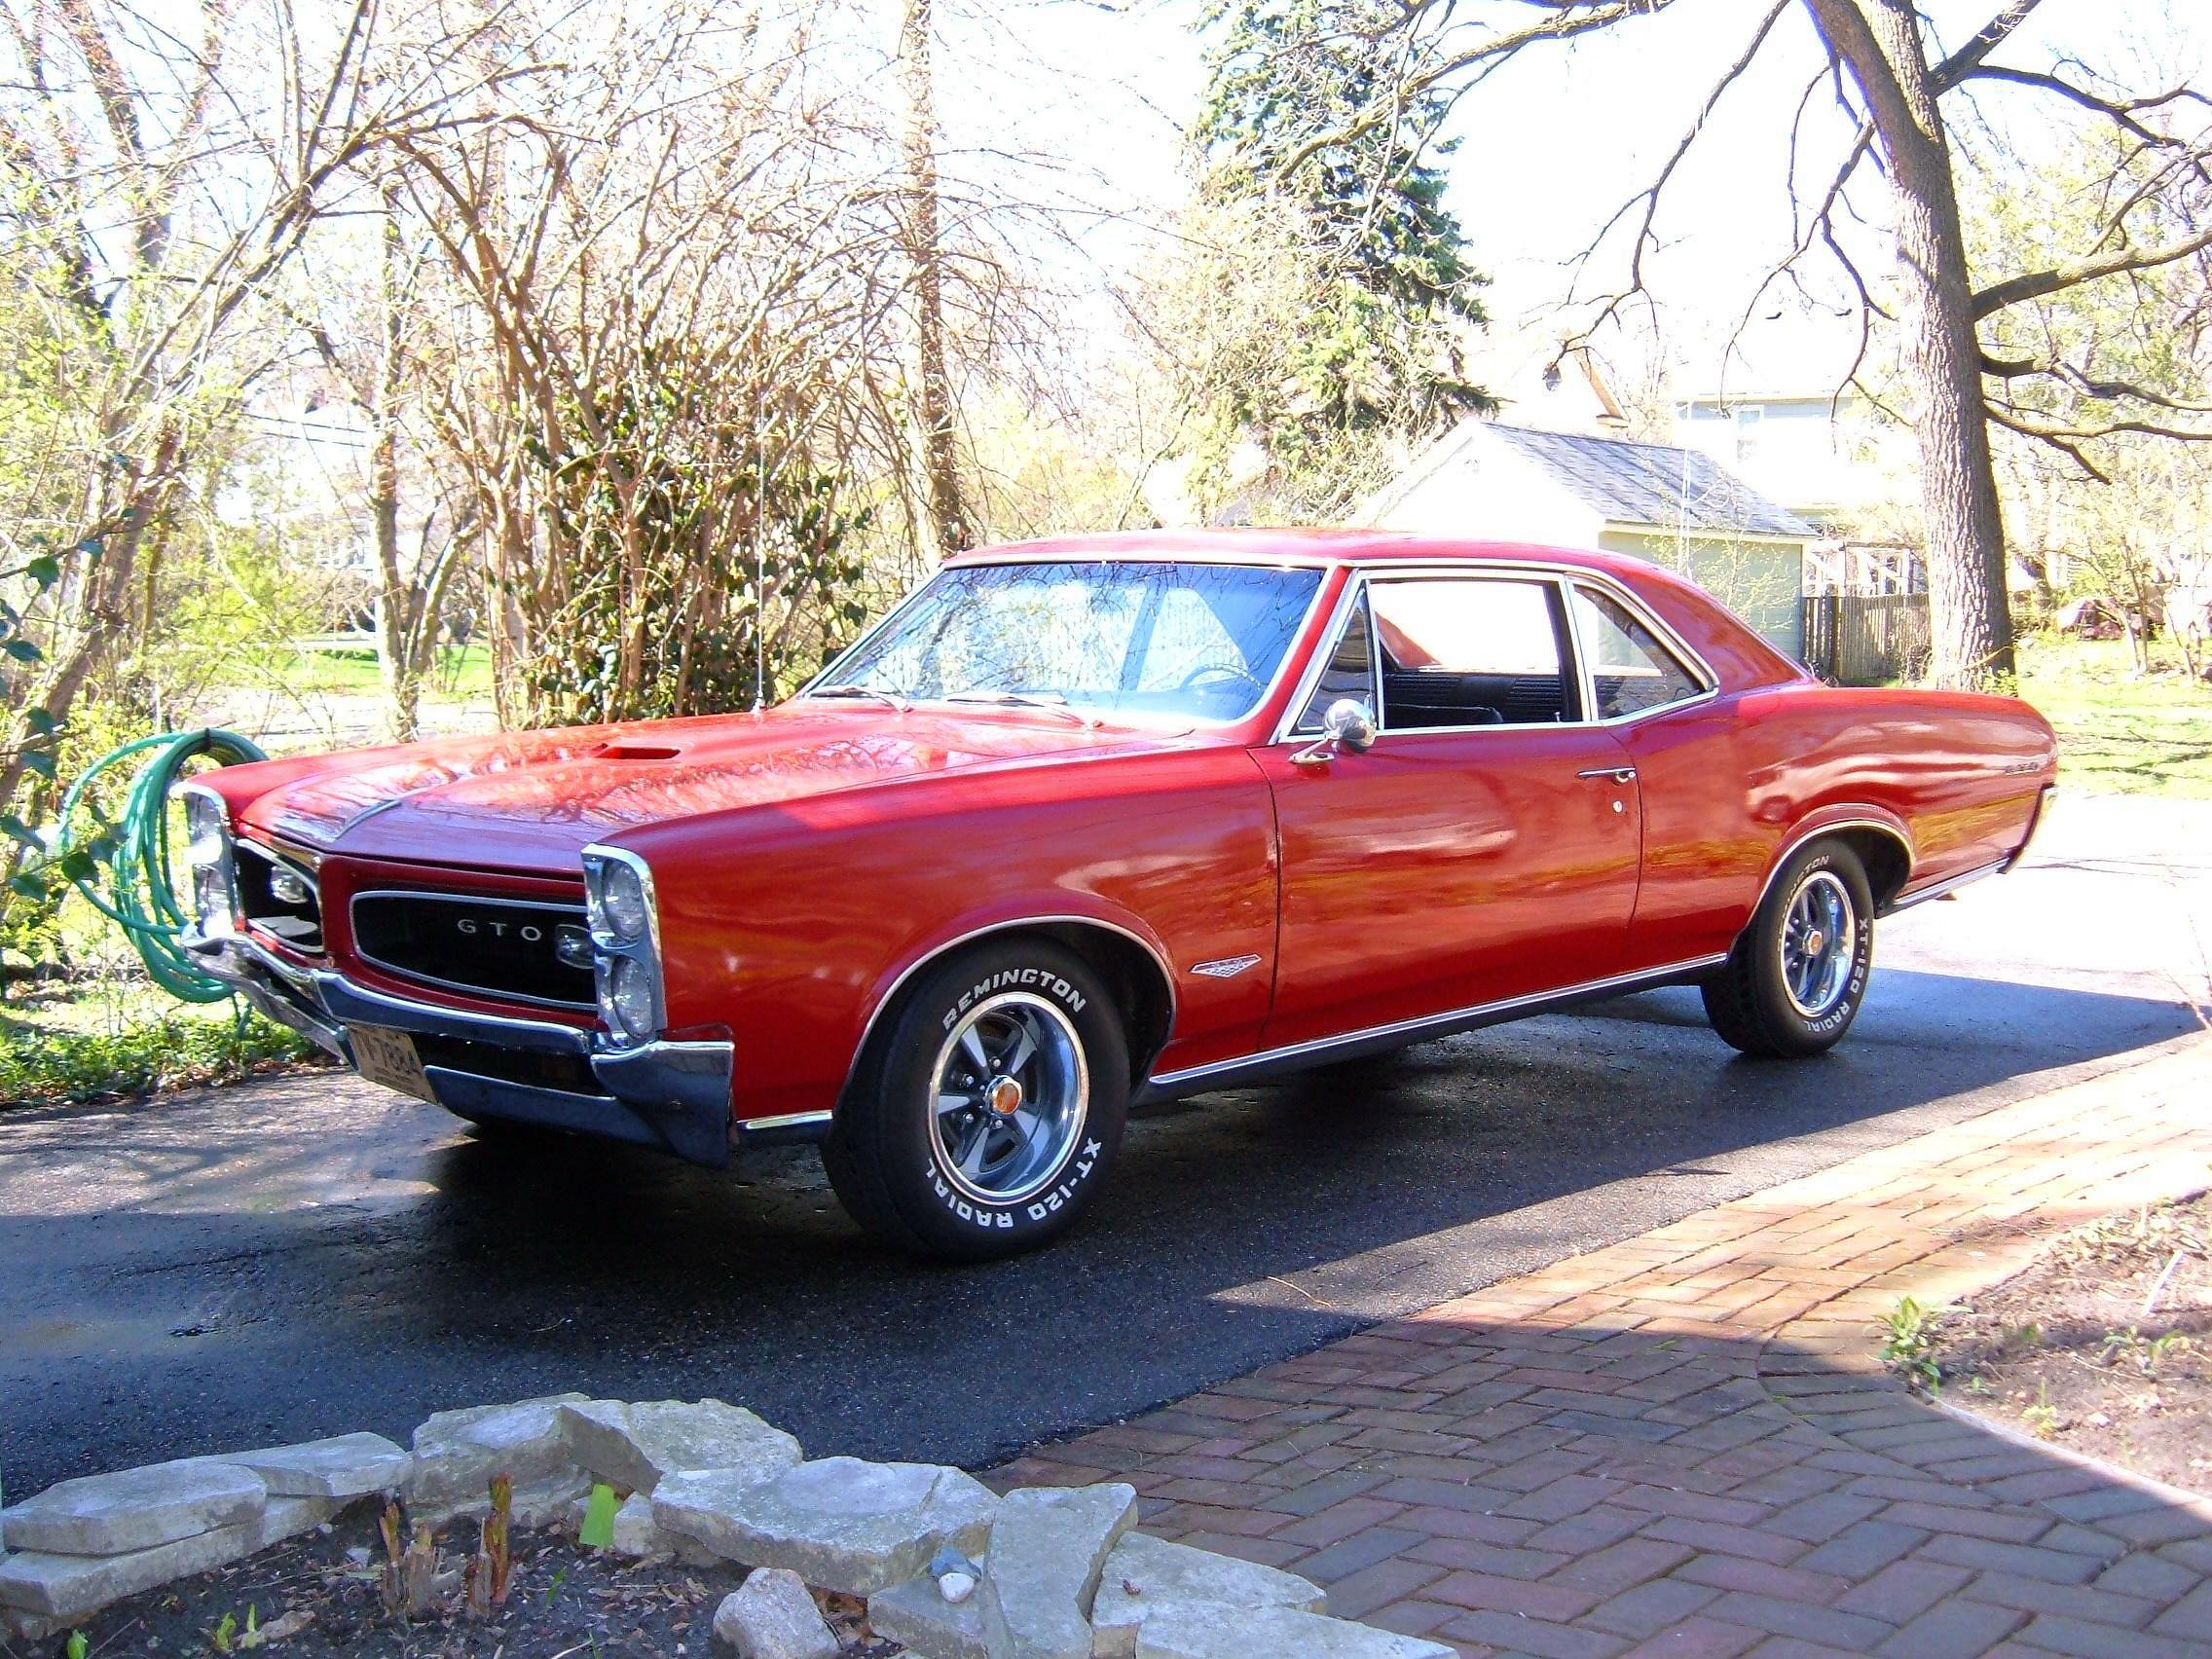 Unique Older Pontiac Models Ideas - Classic Cars Ideas - boiq.info